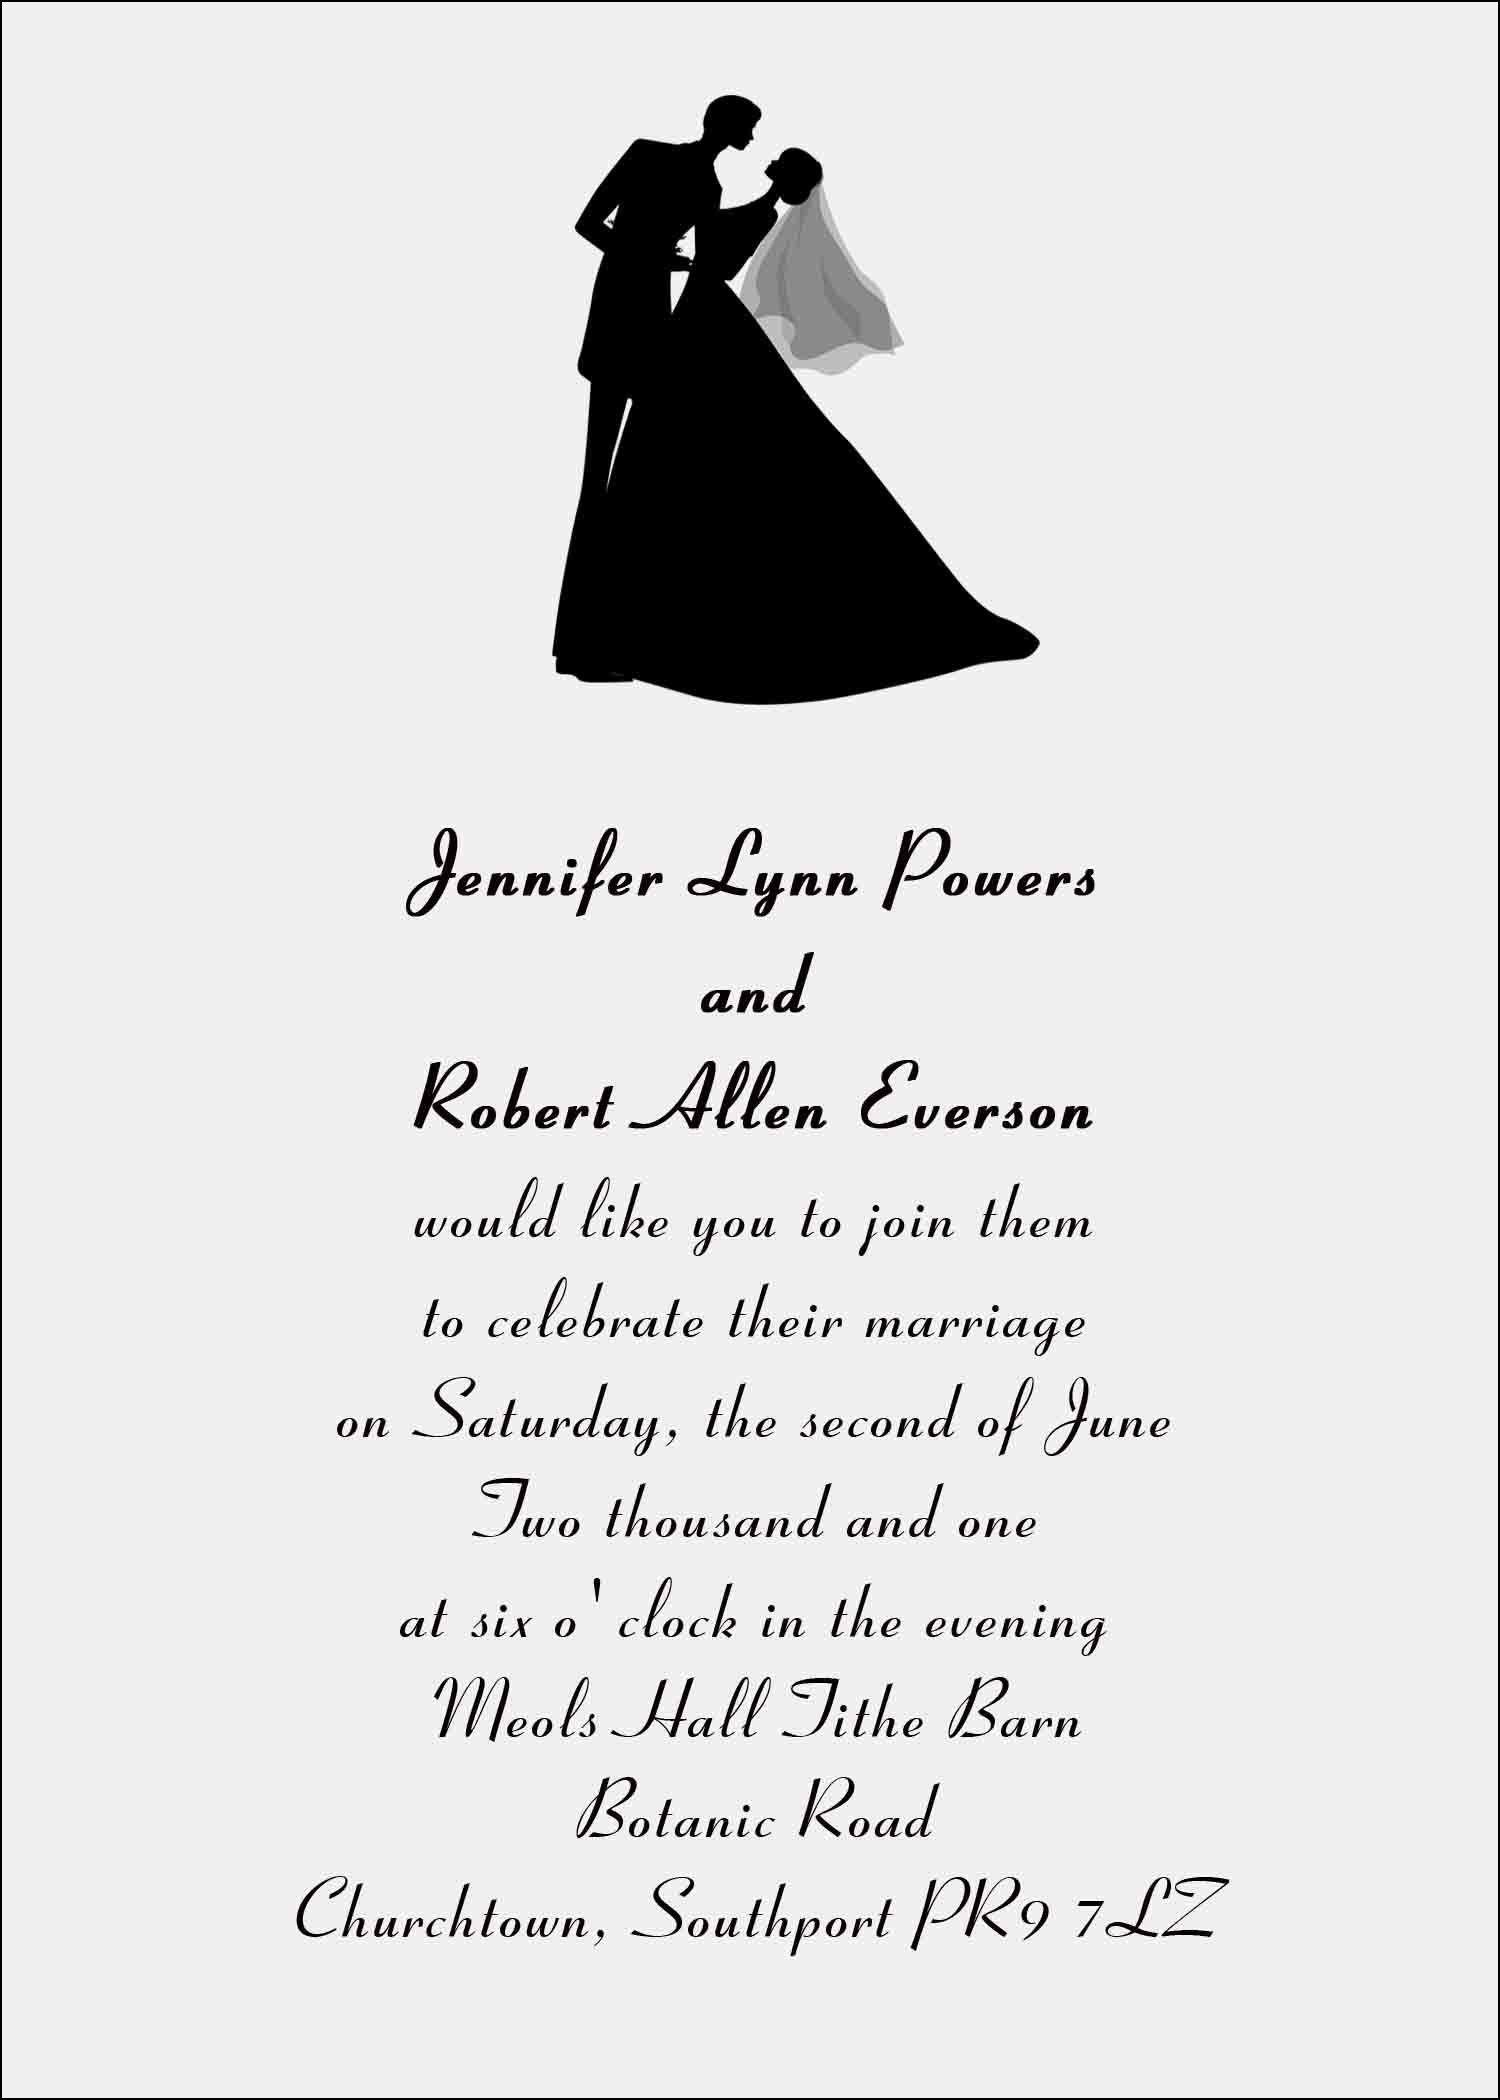 Invitation Card Message for Wedding | Wedding Ideas | Pinterest ...